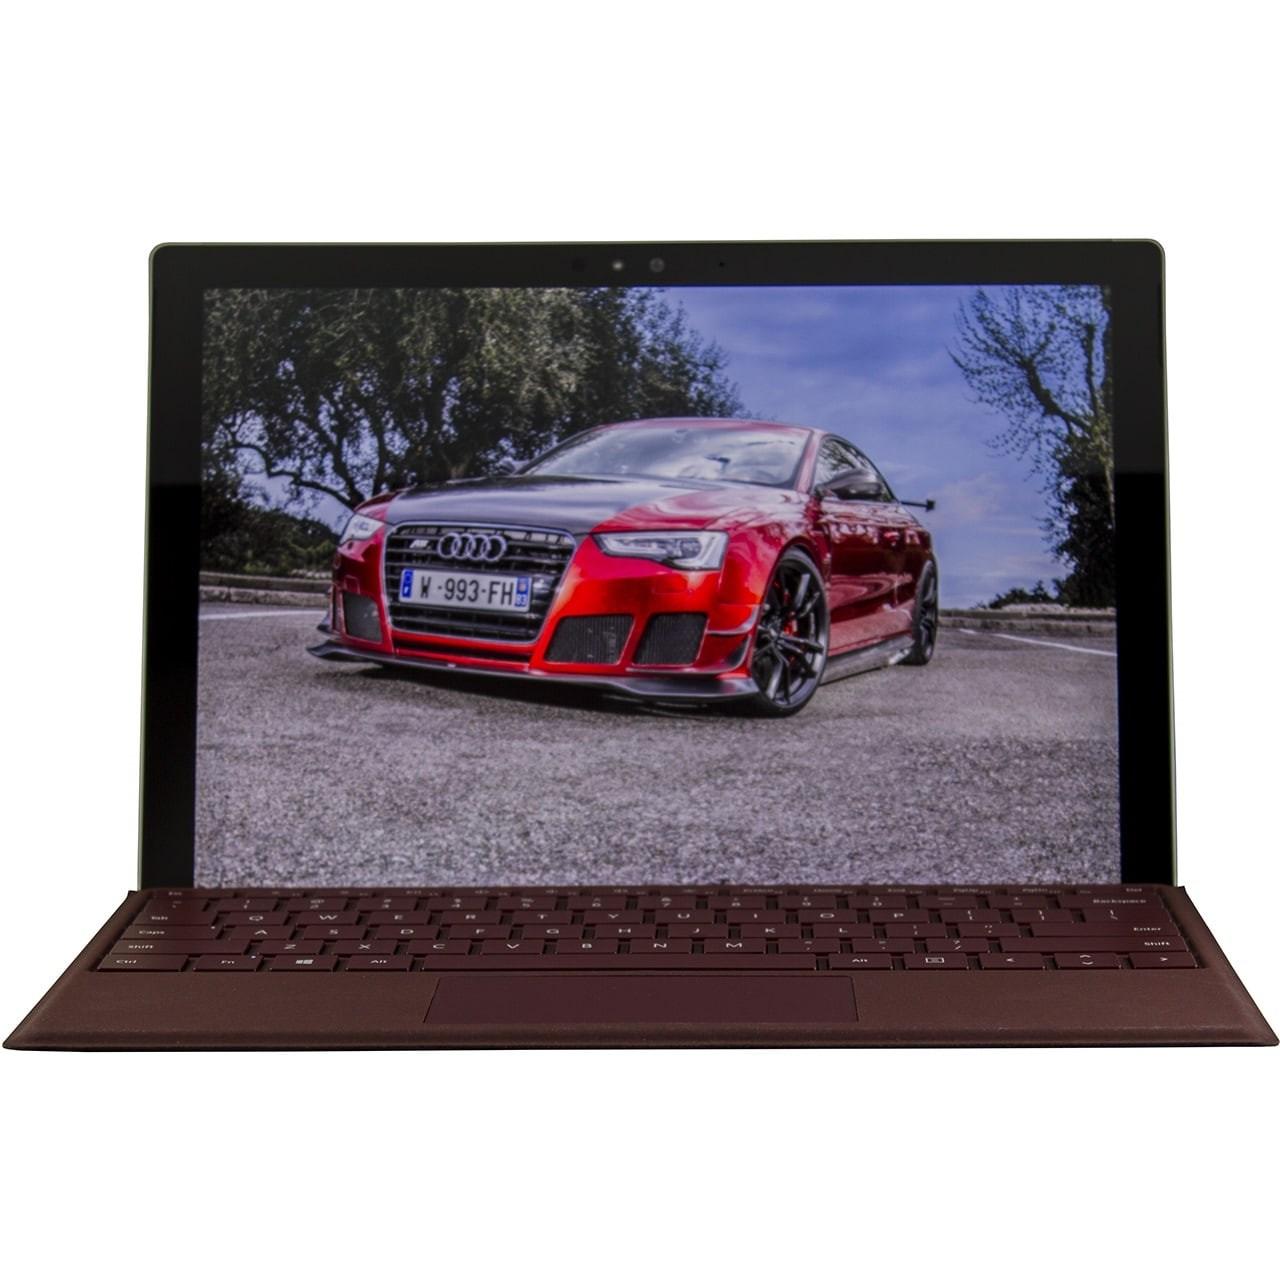 تبلت مایکروسافت مدل Surface Pro 2017 - E به همراه کیبورد سیگنیچر کبود و کیف Golden Guard - ظرفیت 512 گیگابایت